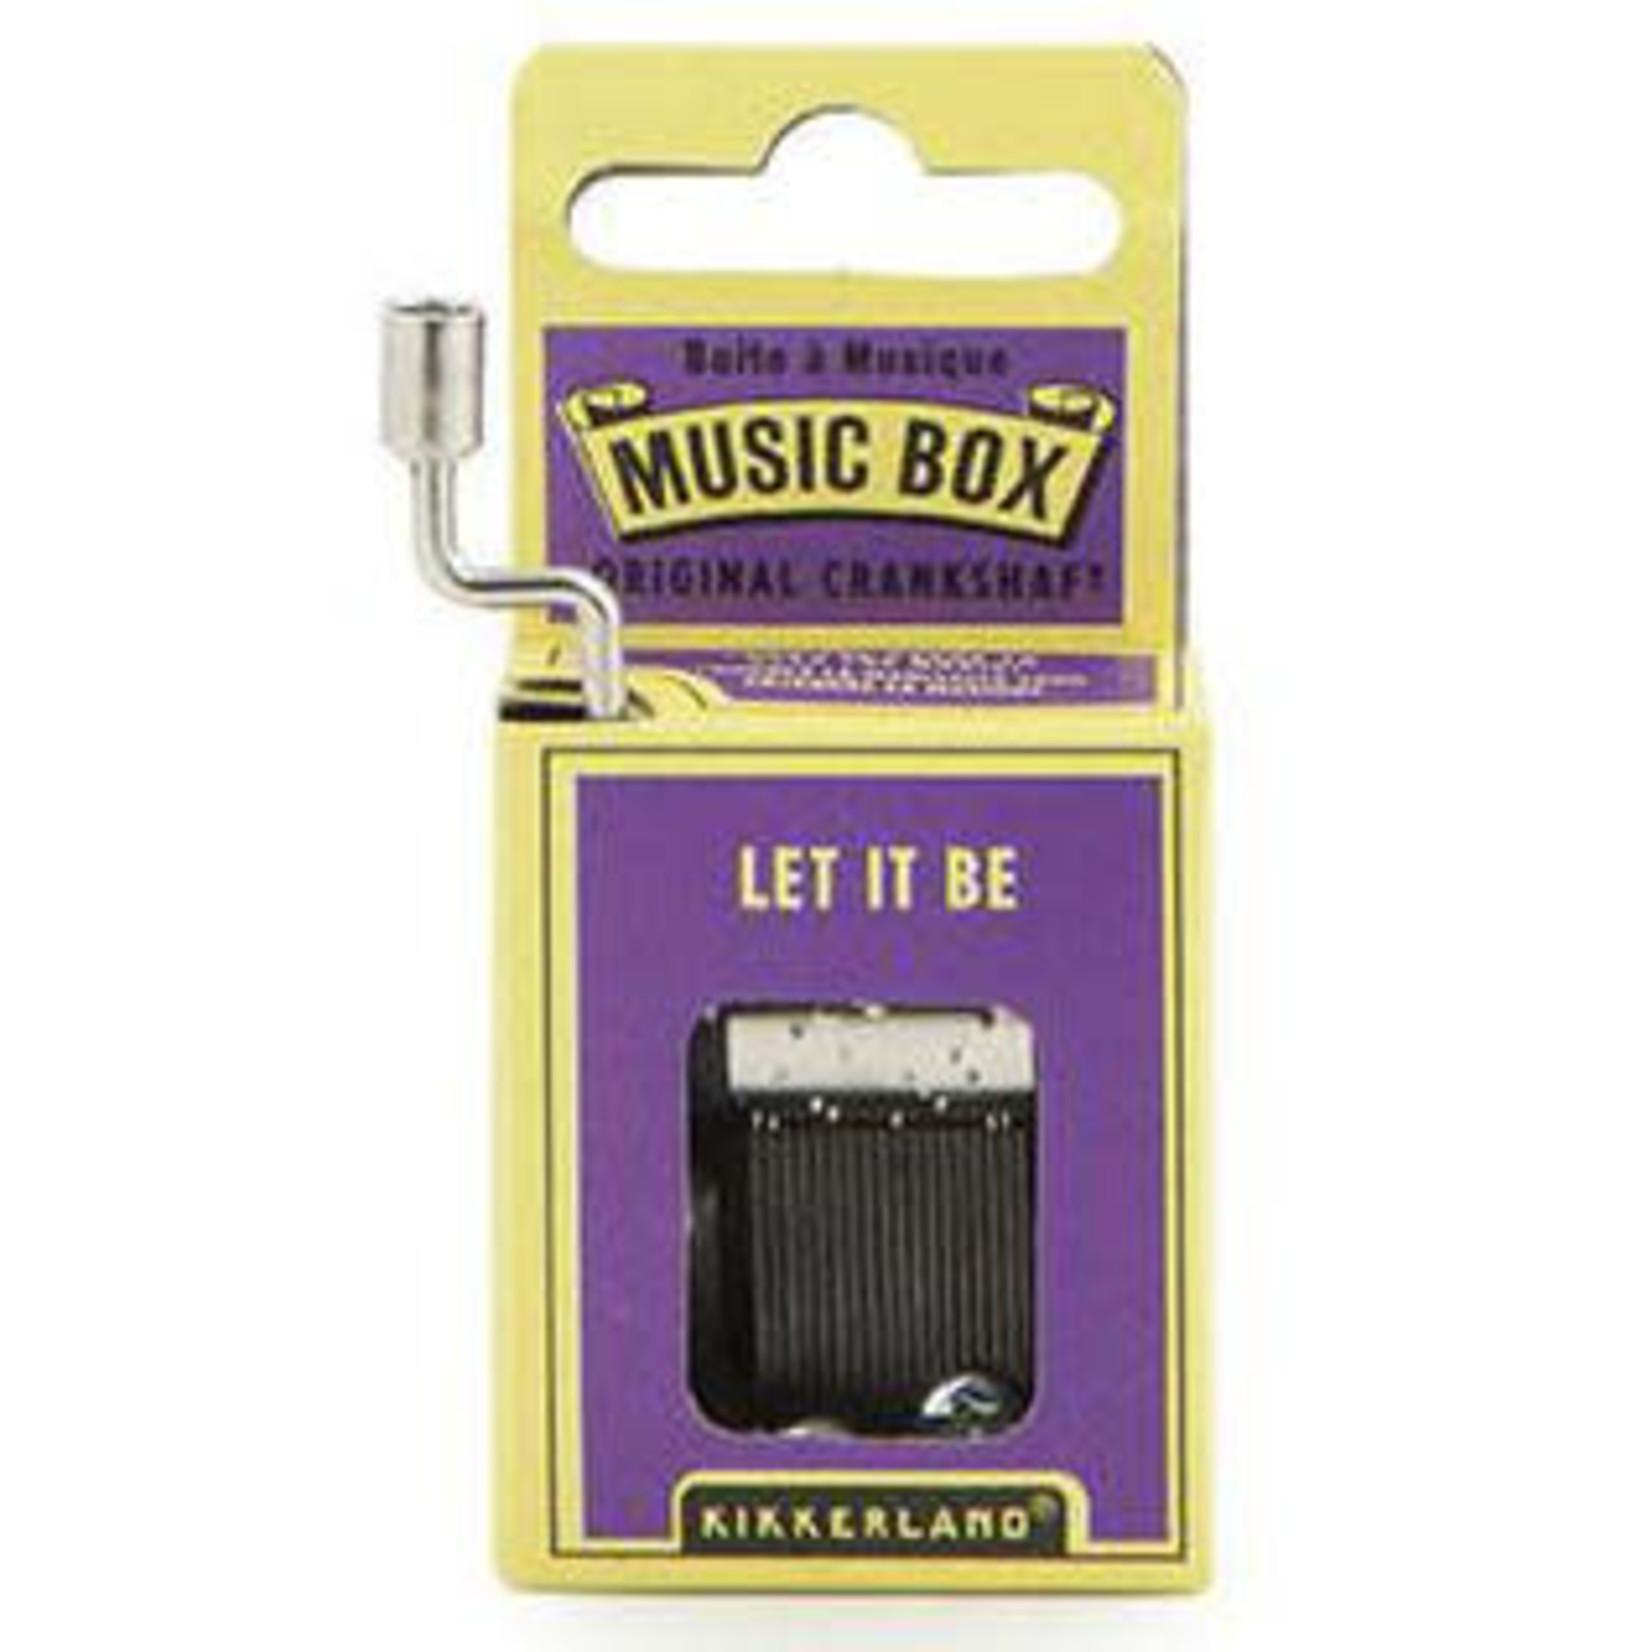 KIKKERLAND LET IT BE MUSIC BOX